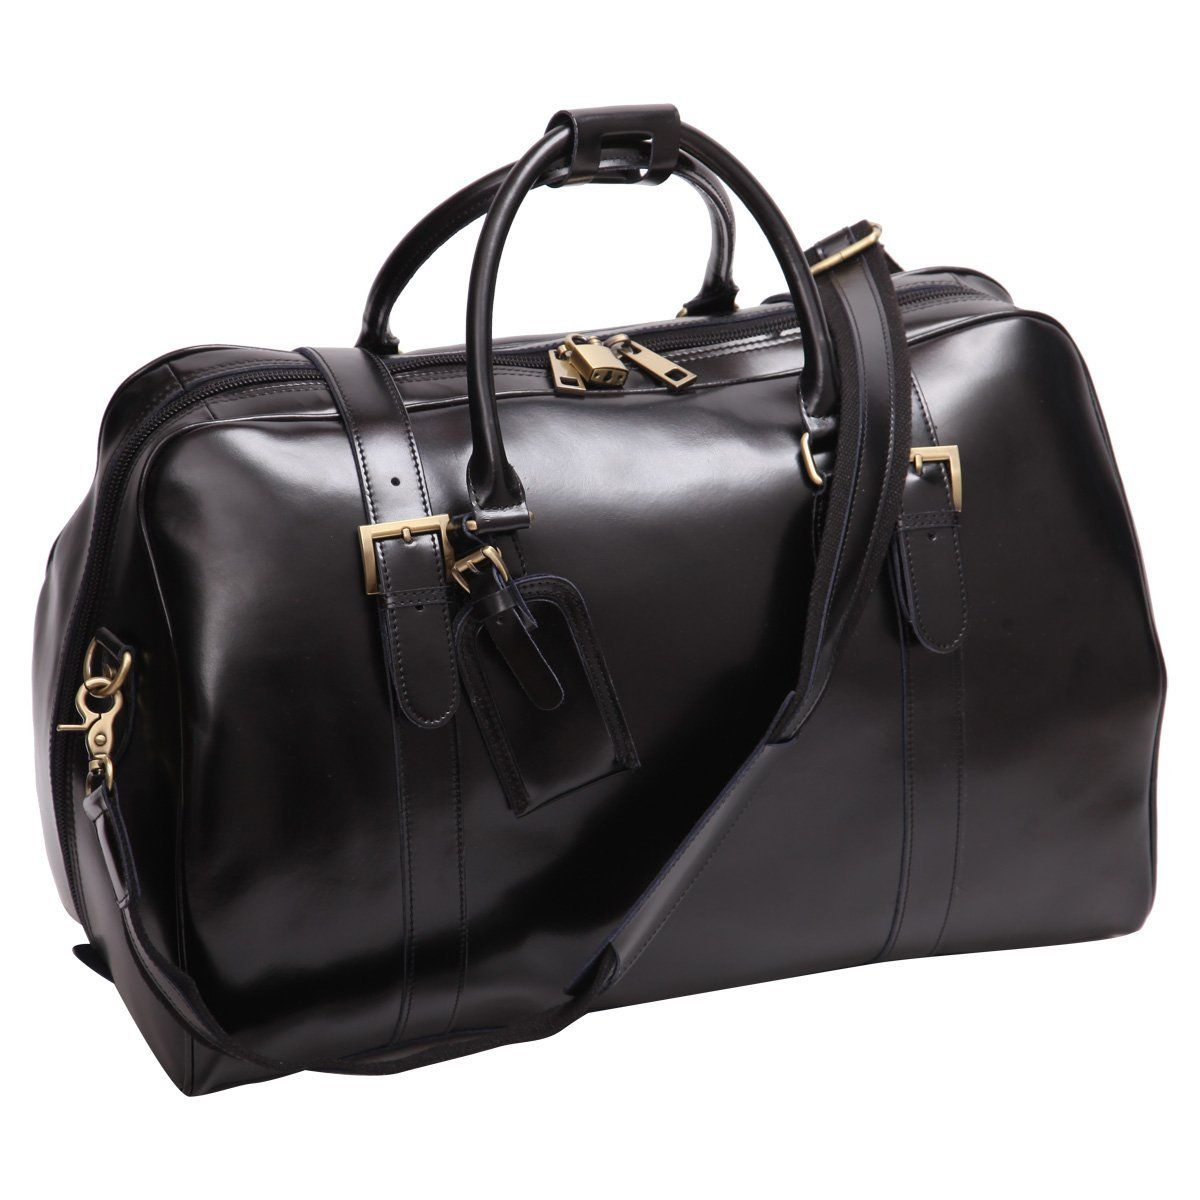 Leathario Sac de Voyage en Cuir Homme Cabas de Voyage Sac en cuir de week-end Sac Bagage Cabine Marron ou Noir pcMmx